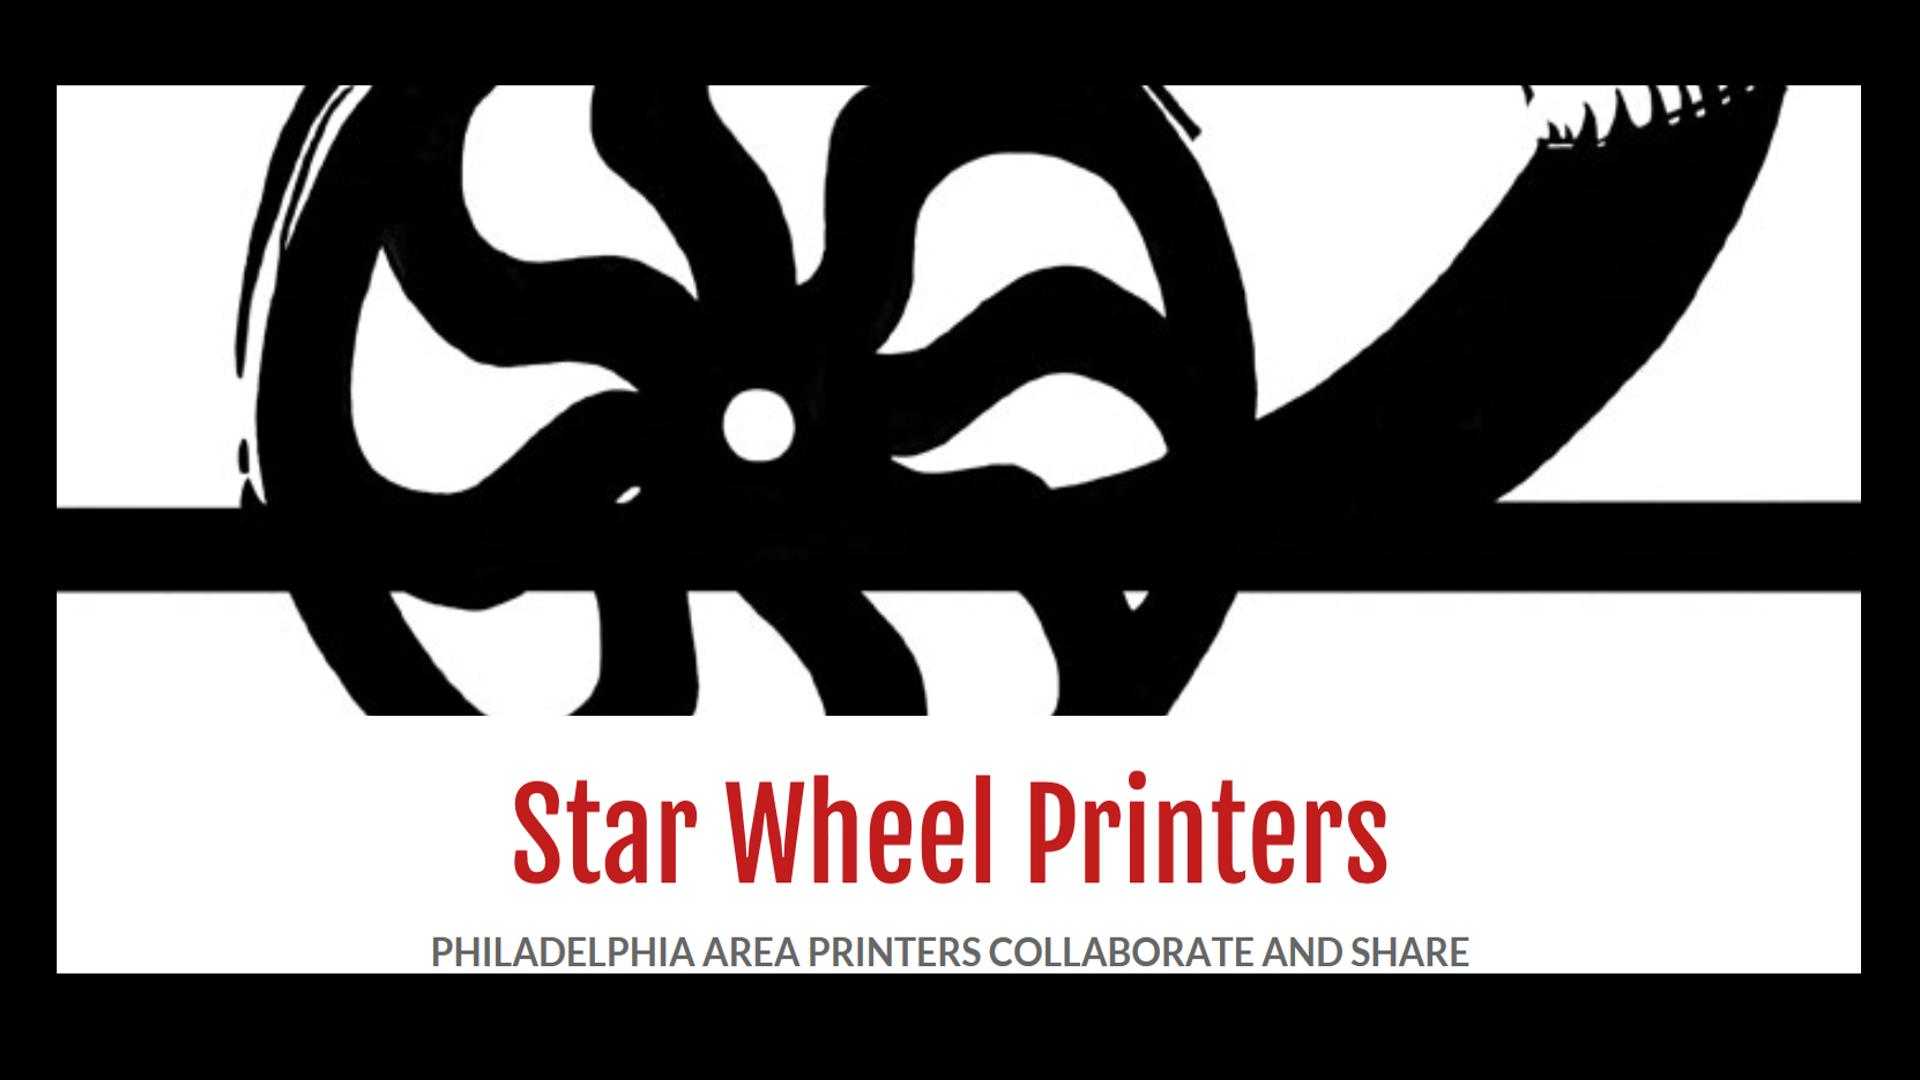 Star Wheel Printers